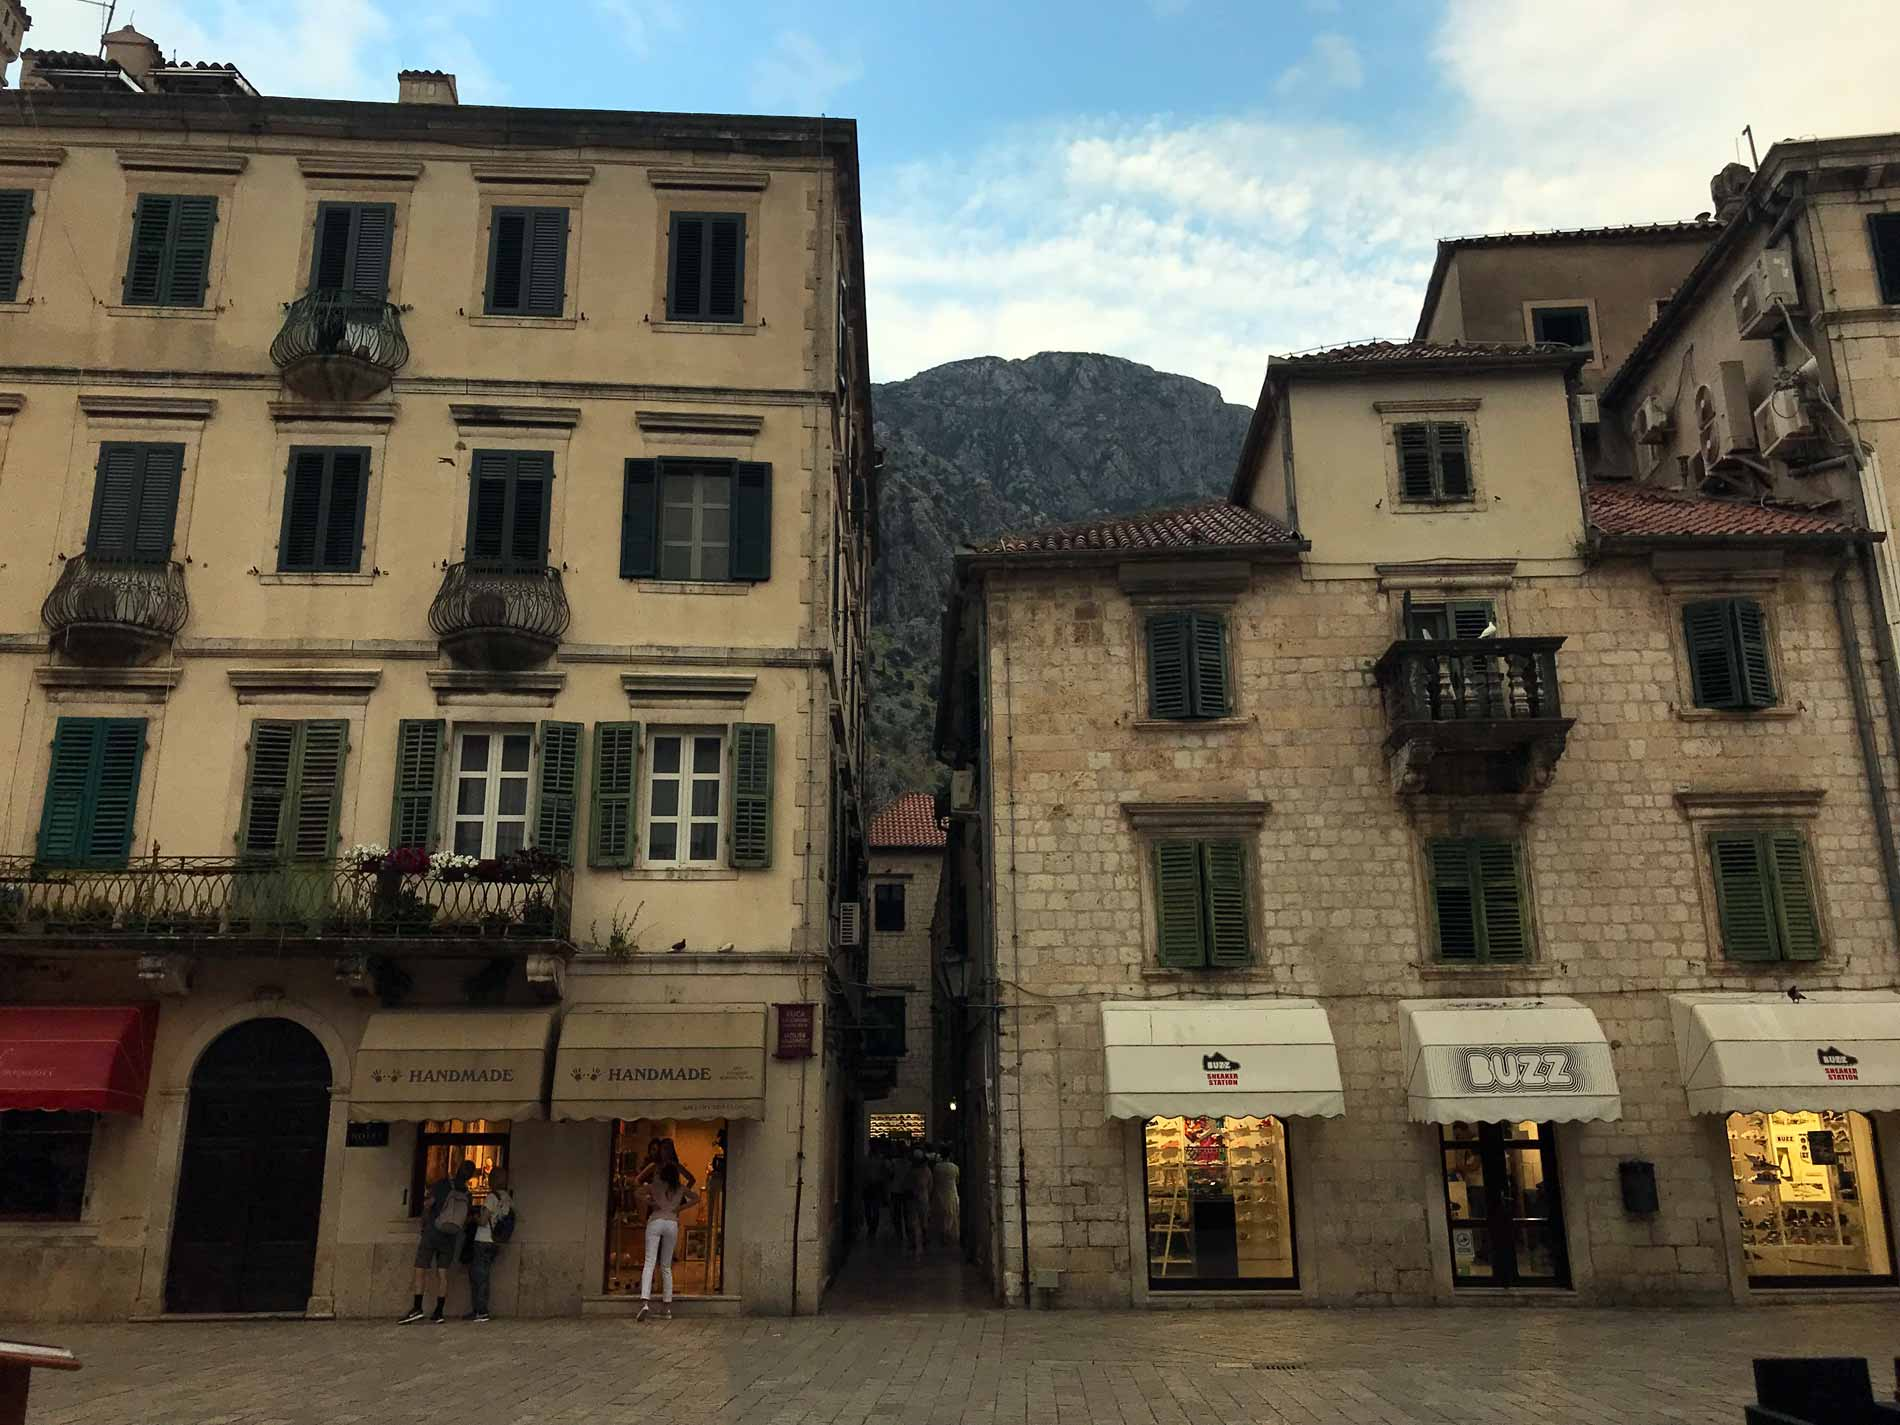 Cattaro-Montenegro-Piazza-dArmi-case-finestre-imposte-verdi